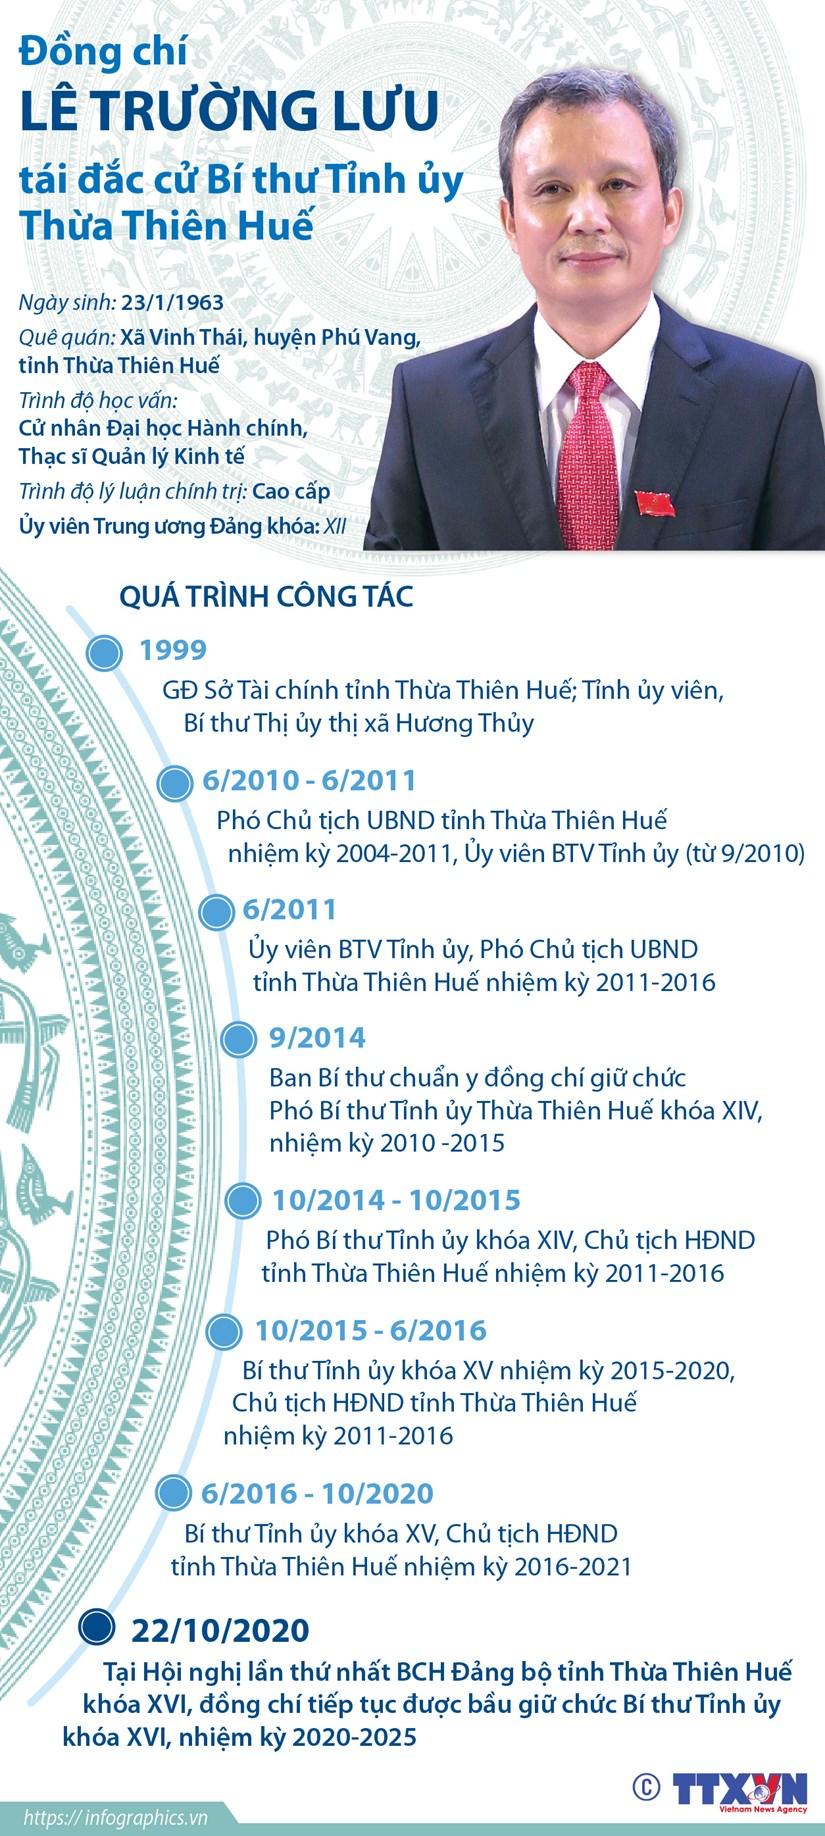 [Infographics] Bi thu Tinh uy Thua Thien-Hue Le Truong Luu hinh anh 1